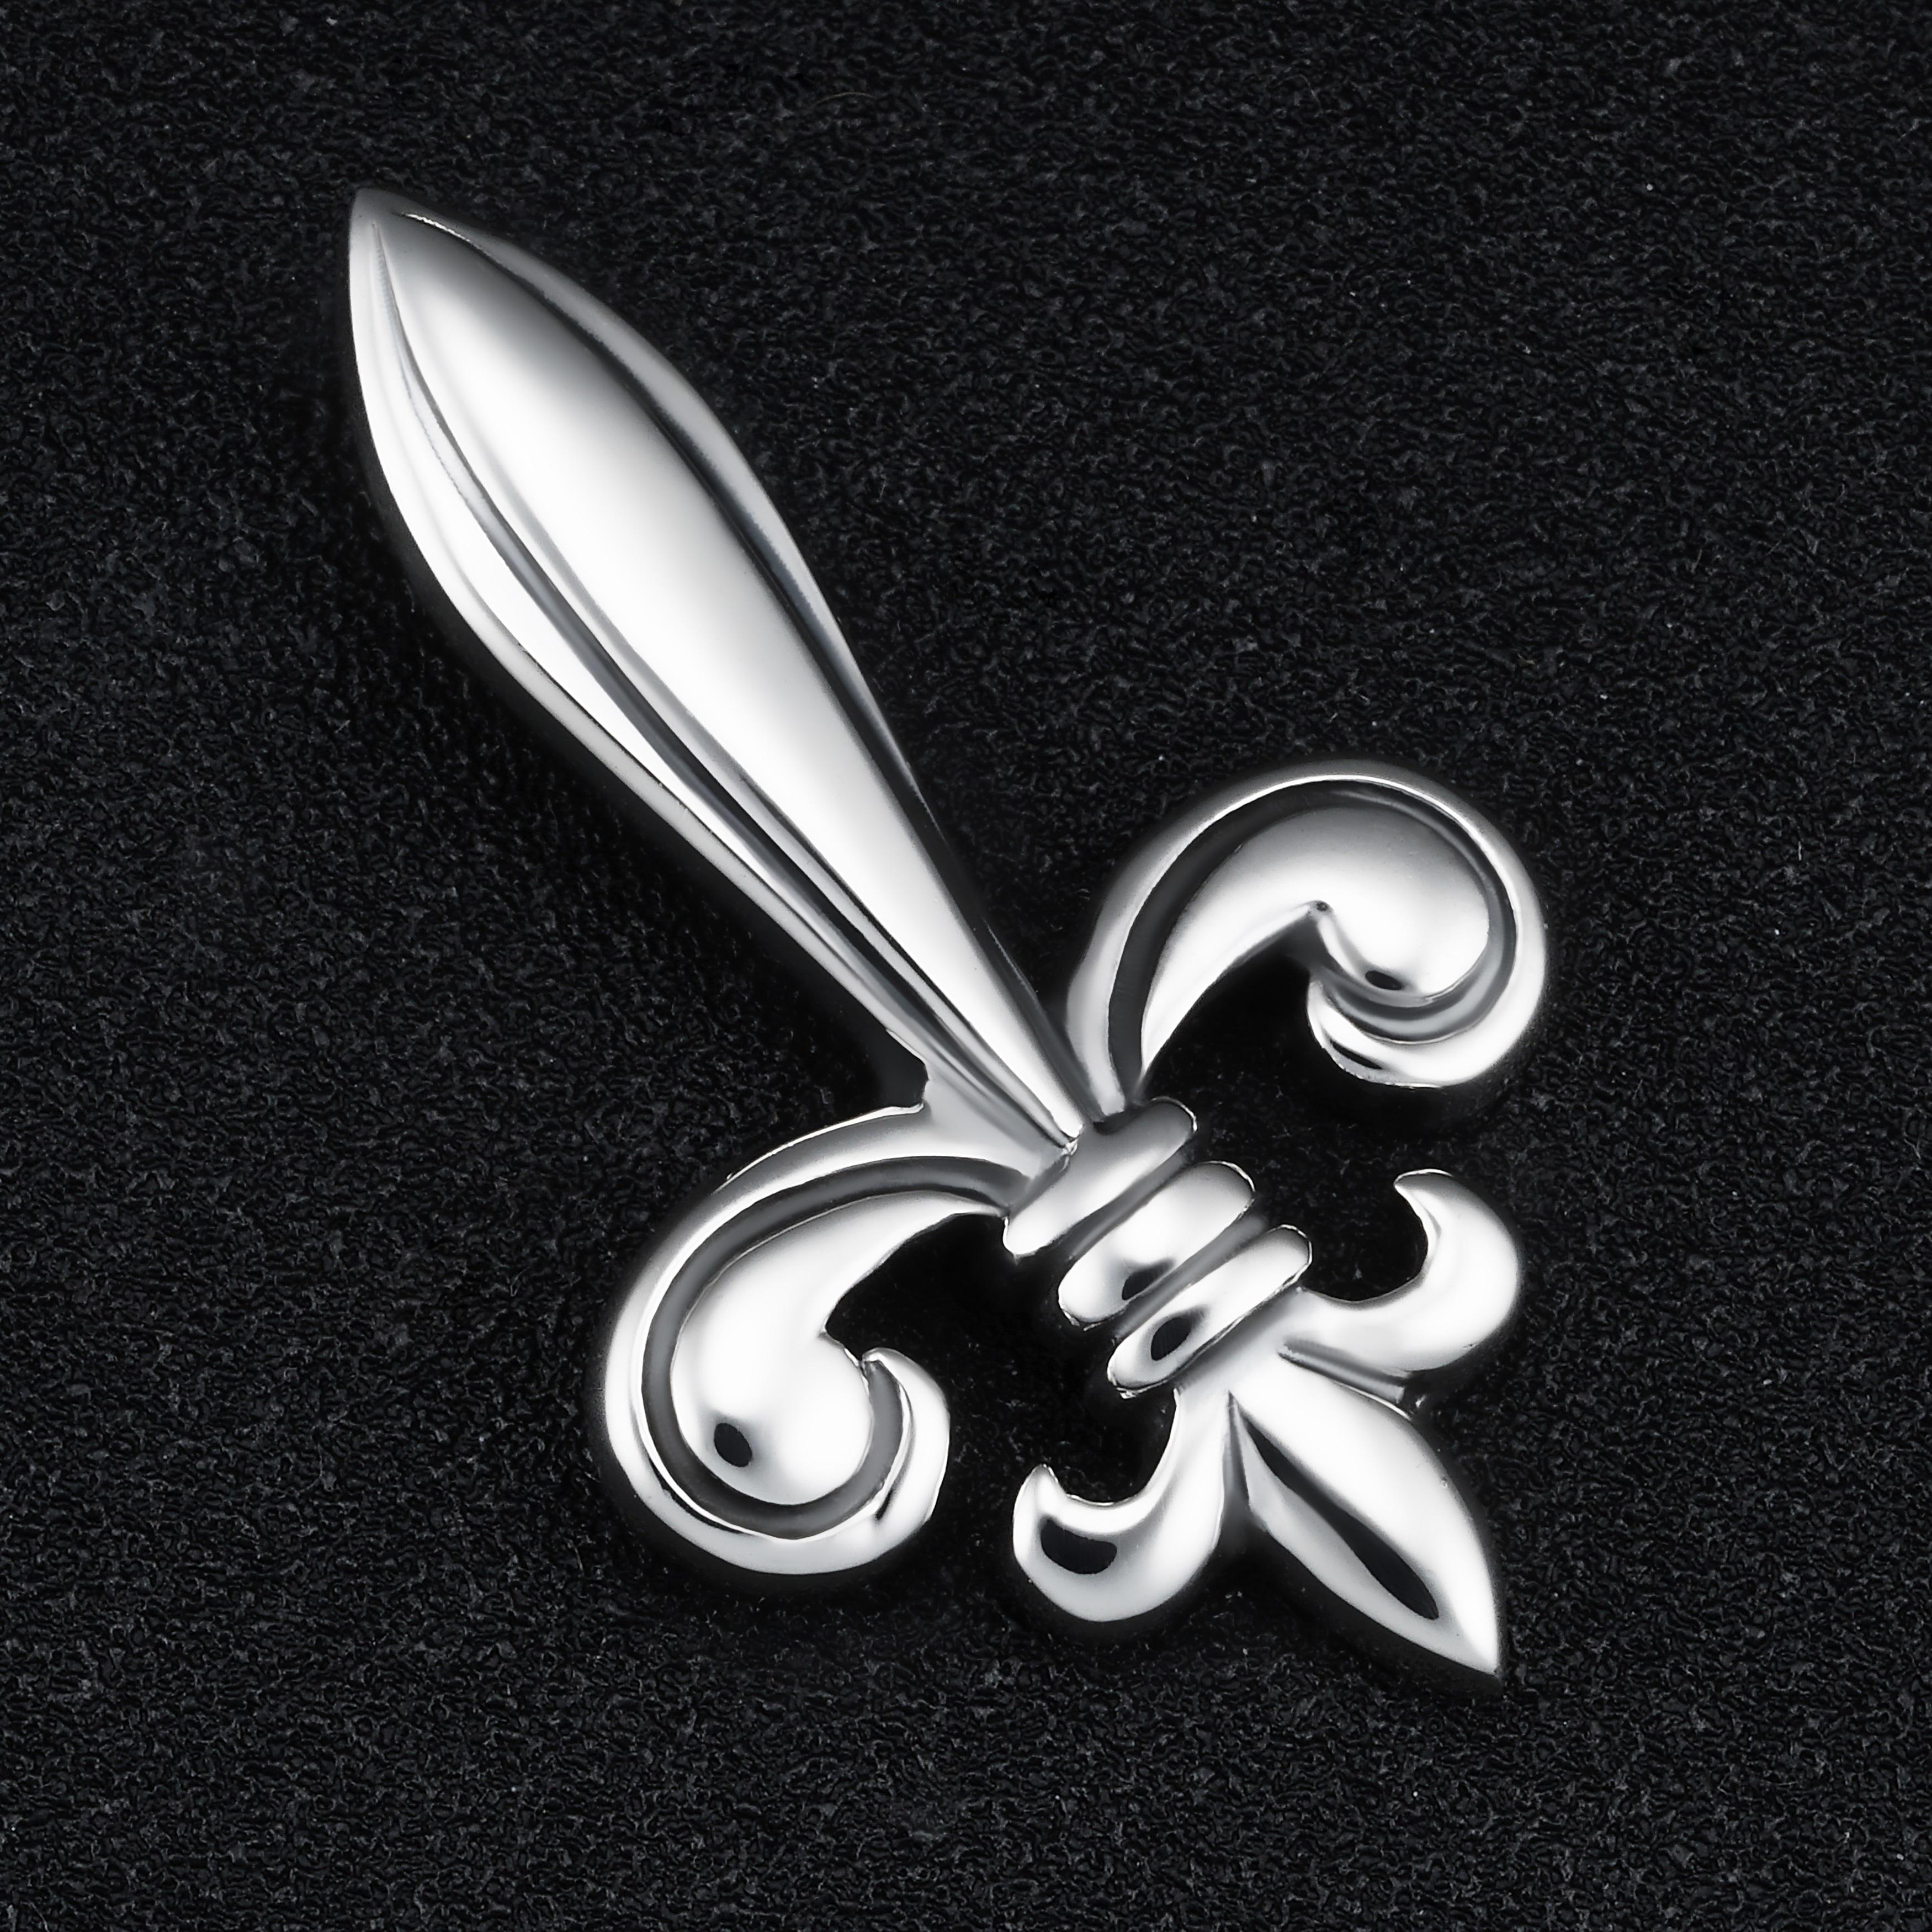 FLEUR DE LIS CURB LINK STERLING 925 SILVER RING NEW HANDMADE JEWELRY